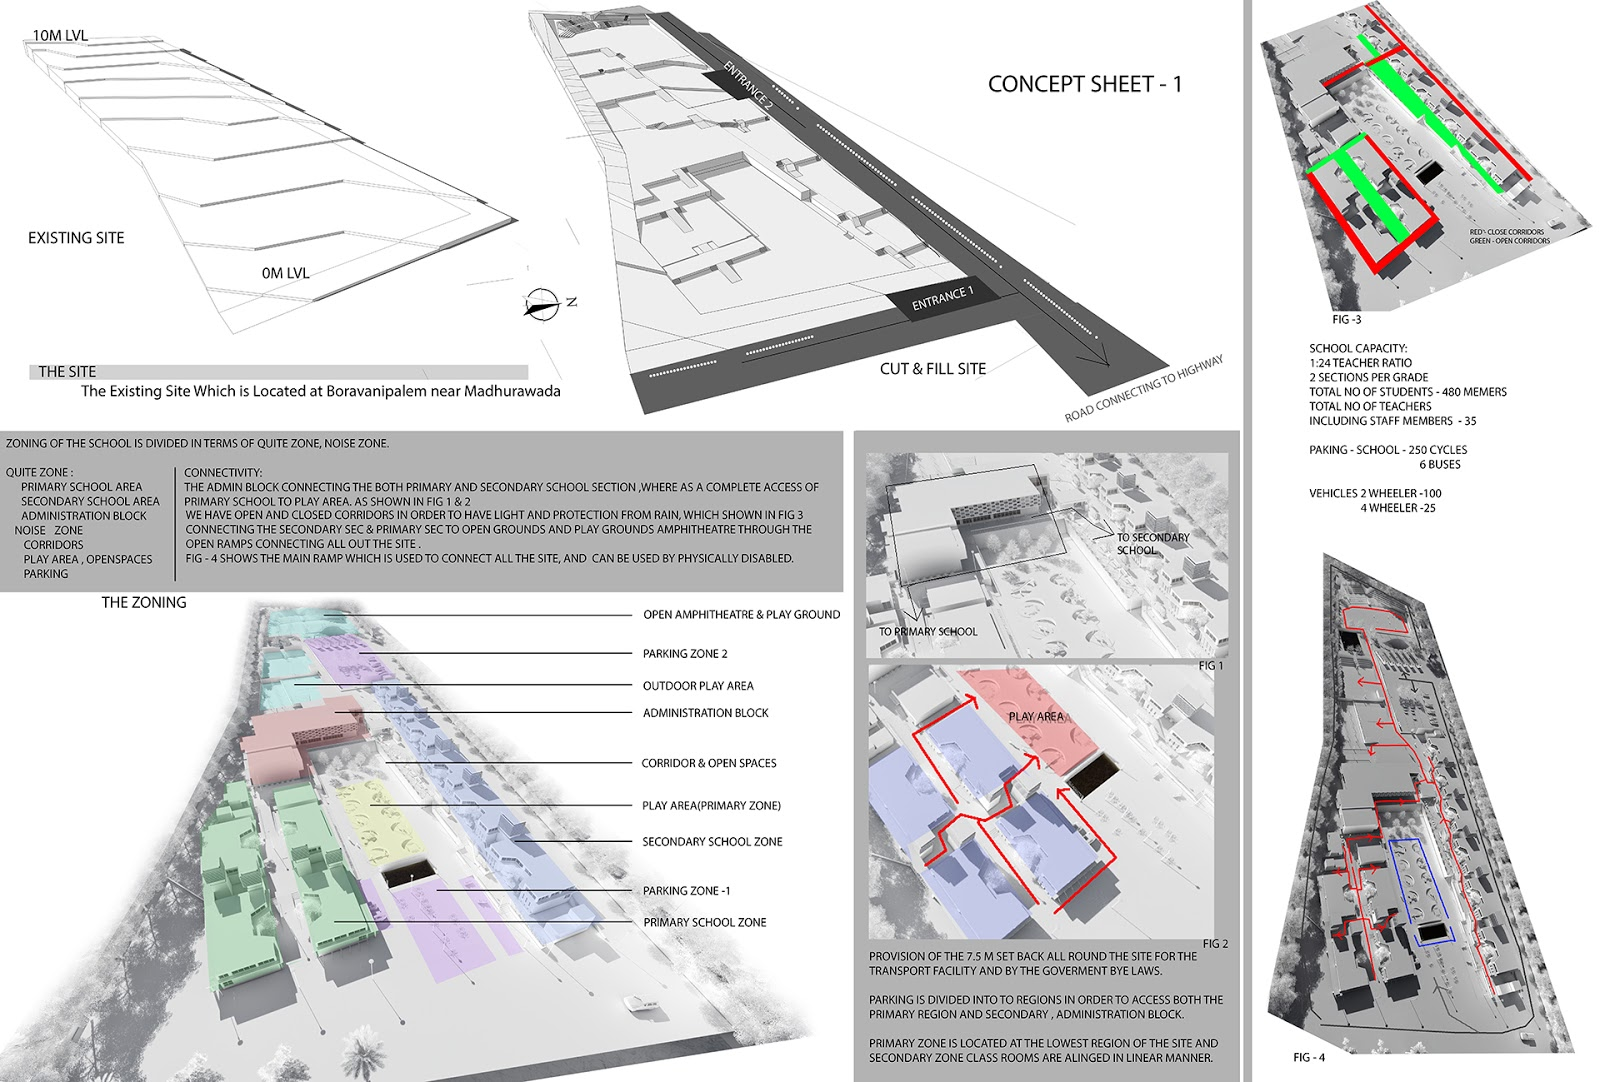 Ar pradeep s v 2016 for Architectural design concept sheet